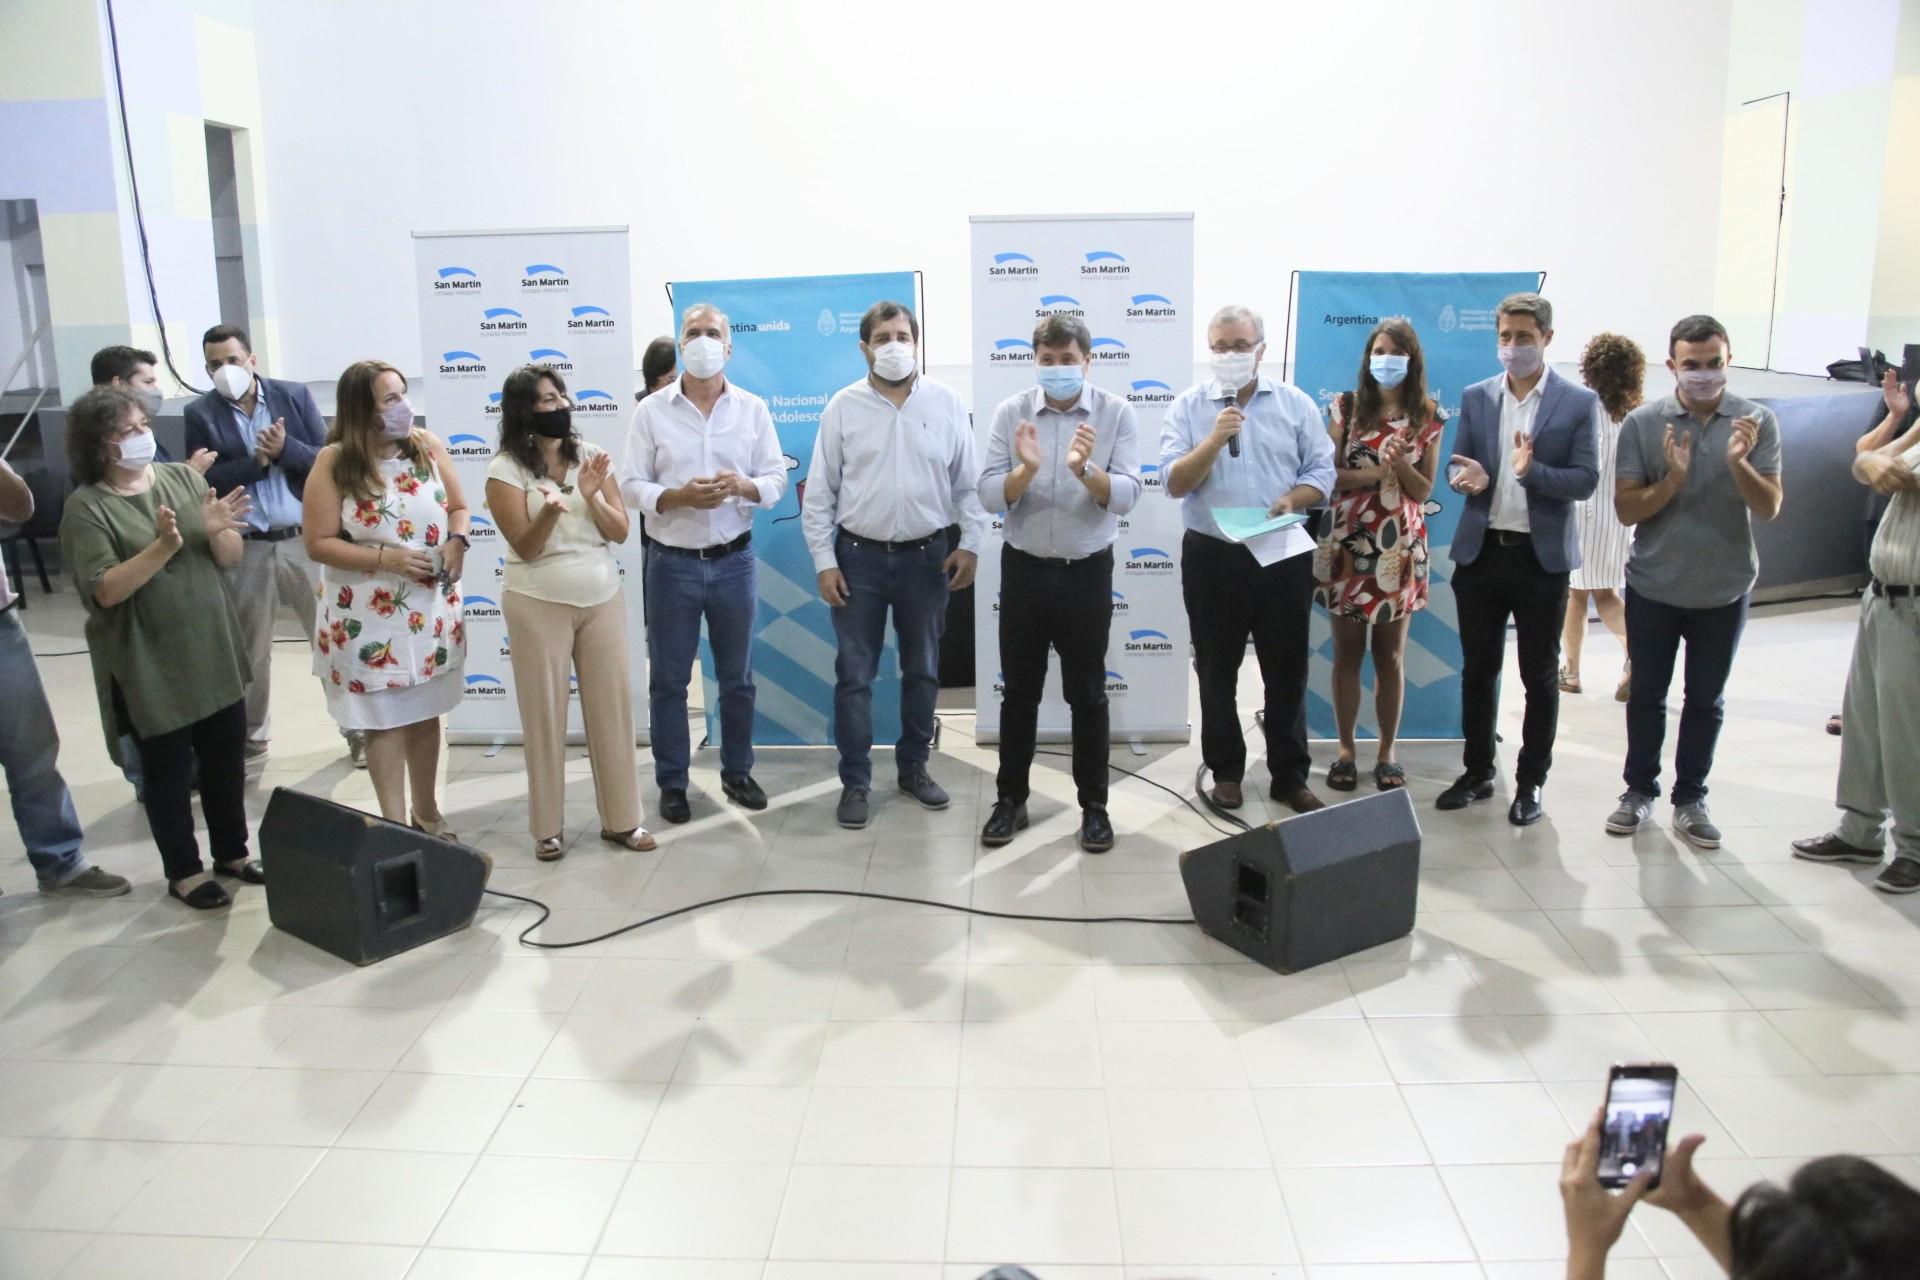 Moreira y Arroyo reinauguraron el Centro Integrador Comunitario de Villa Zagala